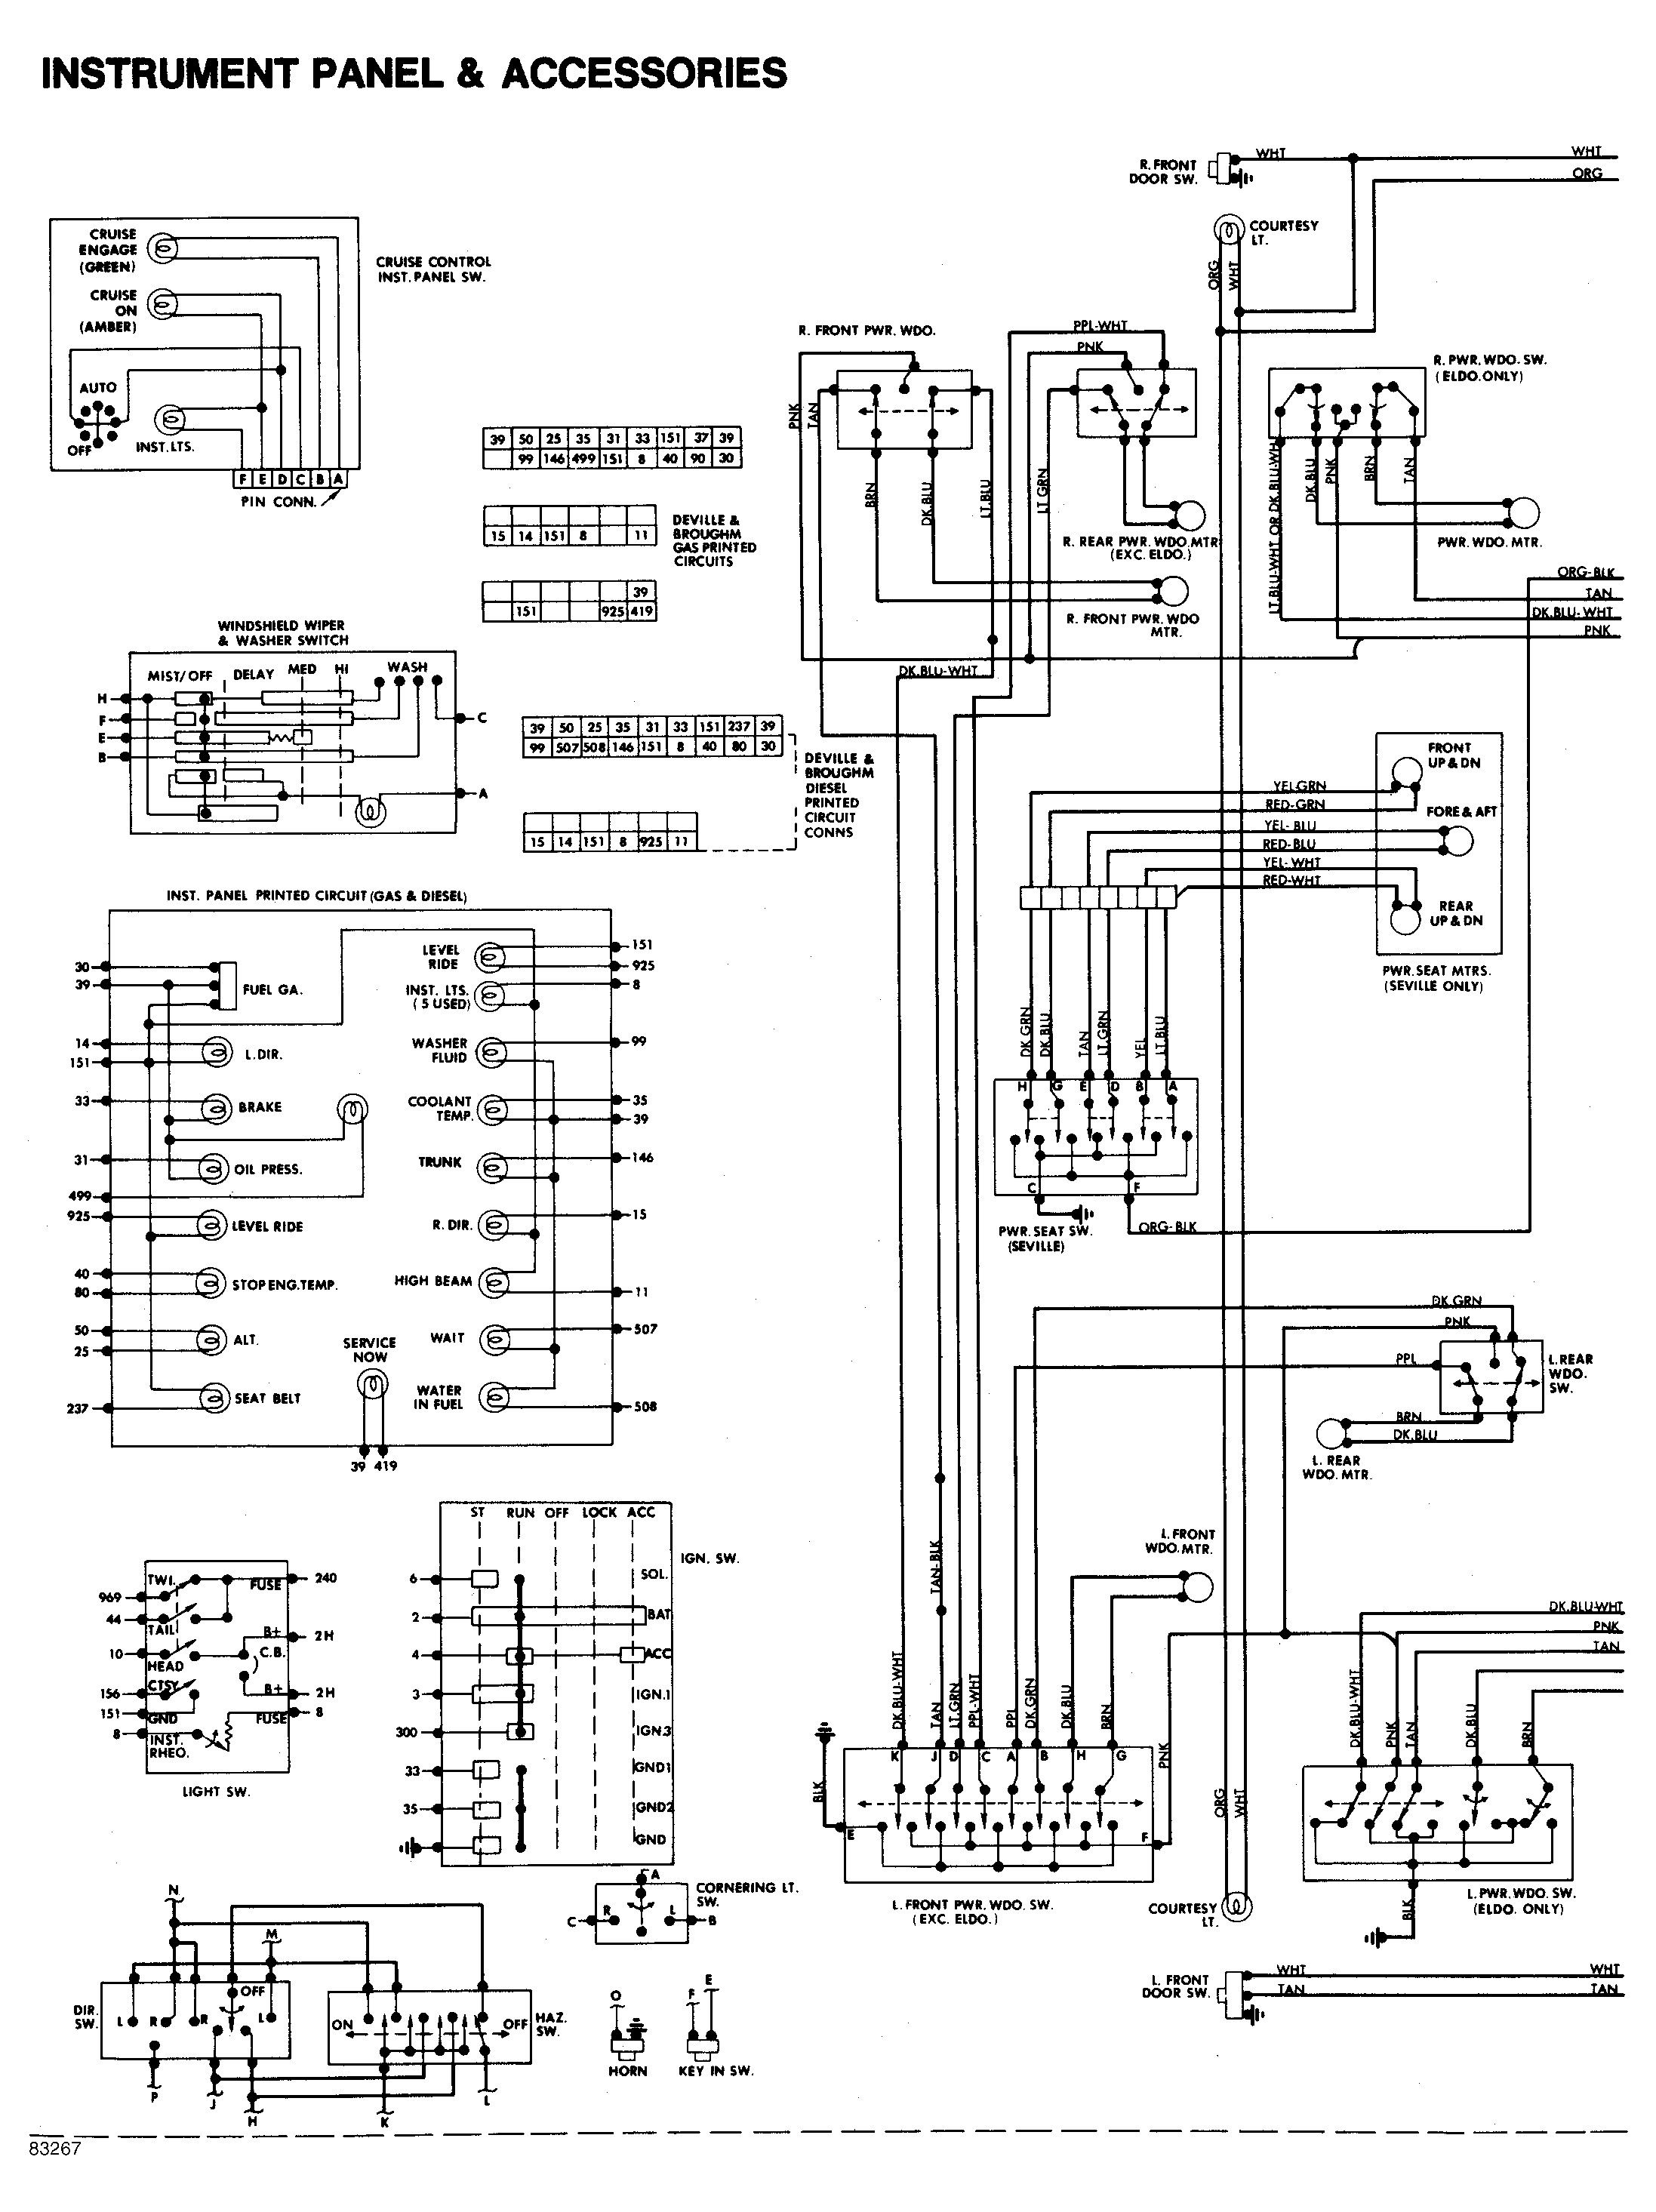 daewoo wiring harness diagram wiring diagram all data Fuel Pump Wiring Harness Diagram daewoo radio wiring diagram manual e books john deere wiring harness diagram daewoo wiring harness diagram